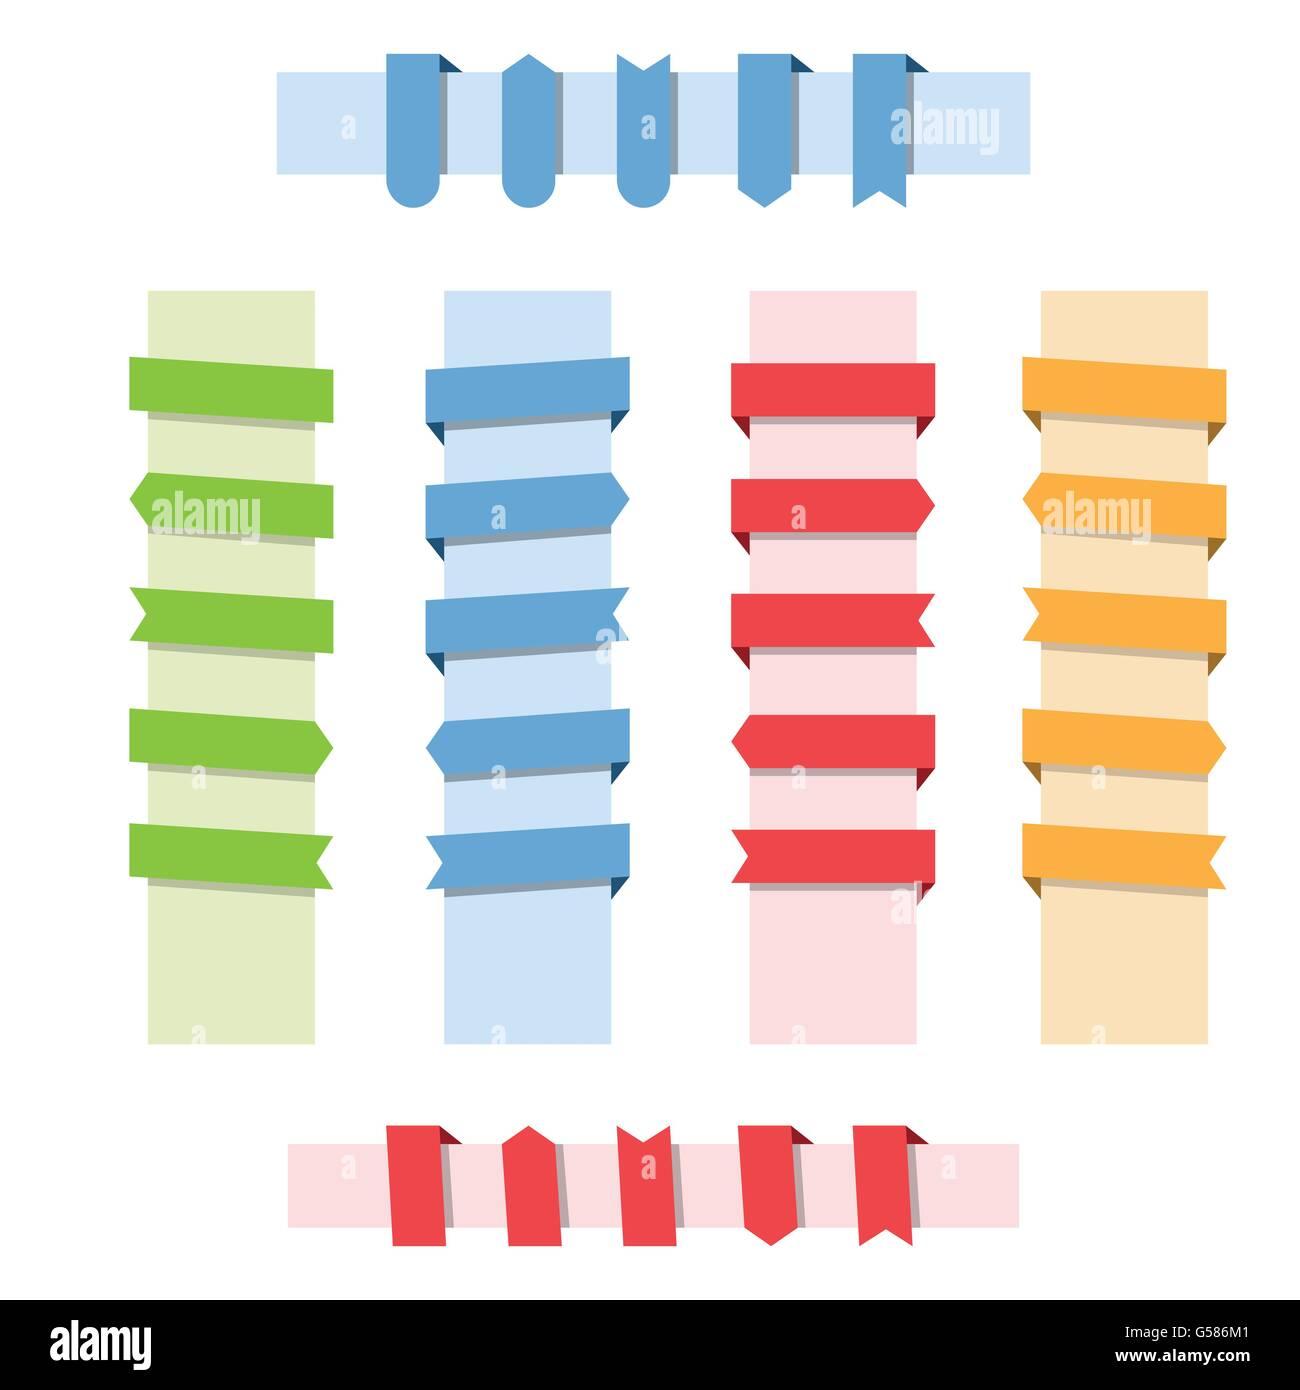 Design elements banner - Stock Vector Web Design Elements Color Ribbon Banner Set Vector